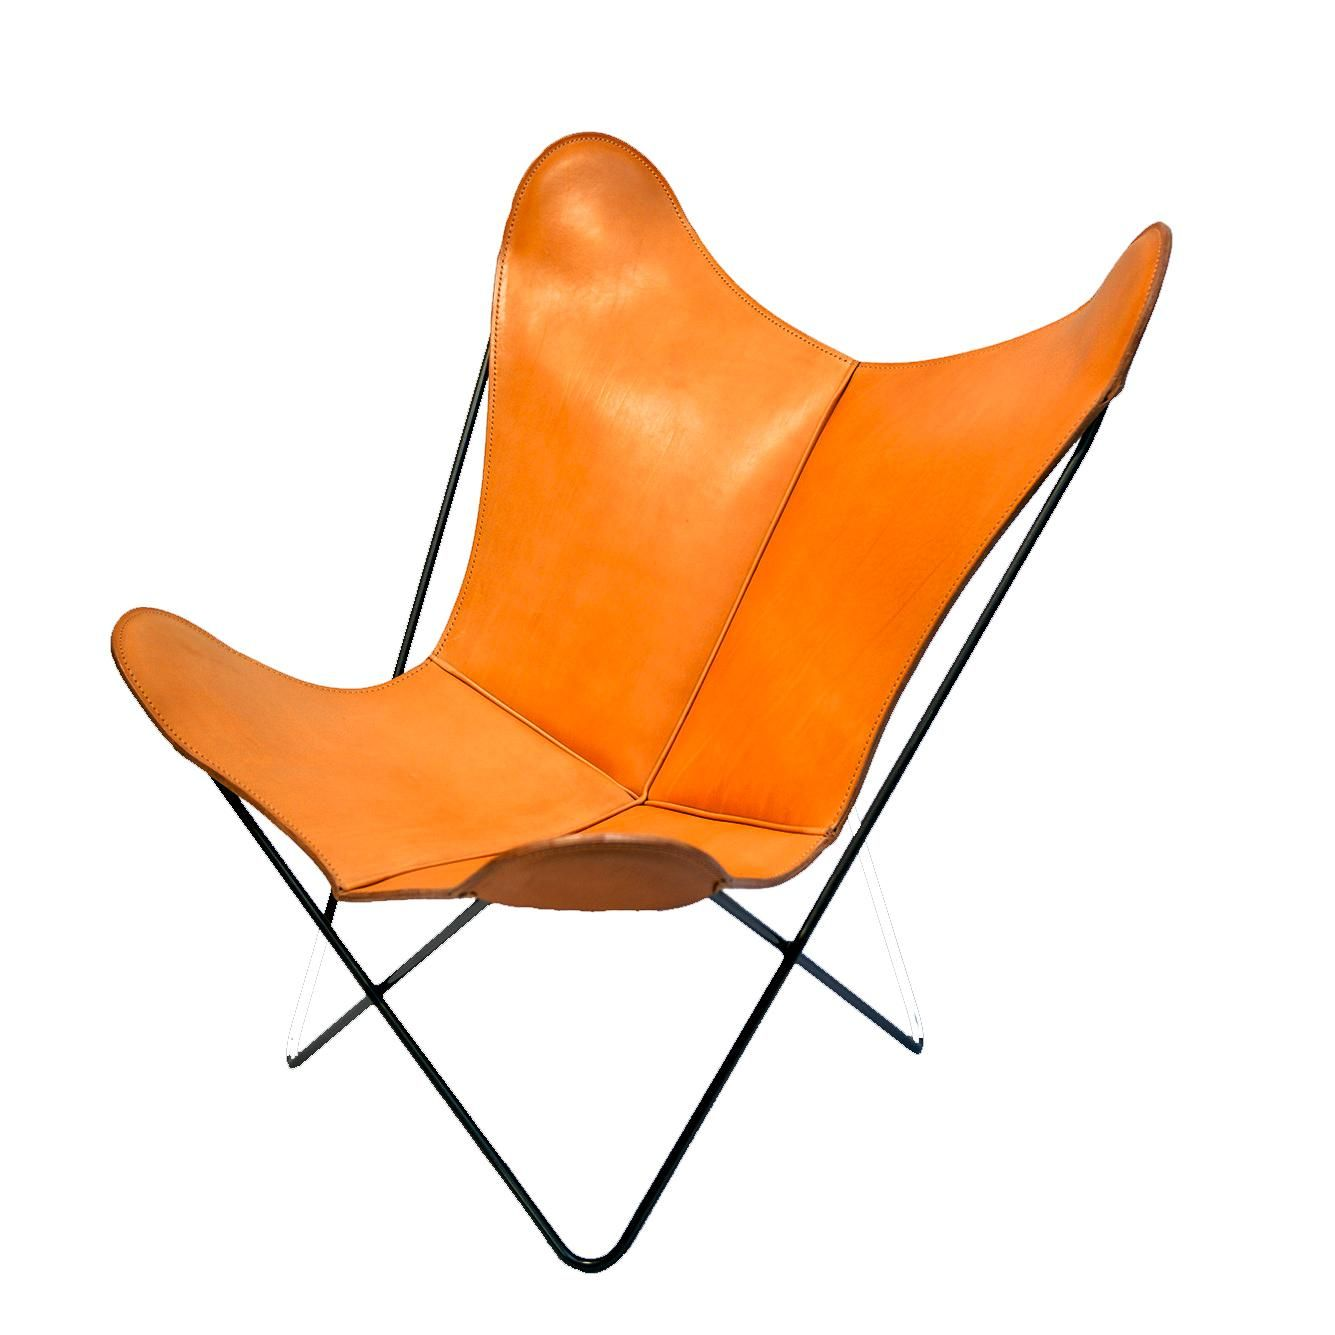 Hardoy Butterfly Chair (Leder) Je Nach Variante Ab Ca. 1000 Fr.